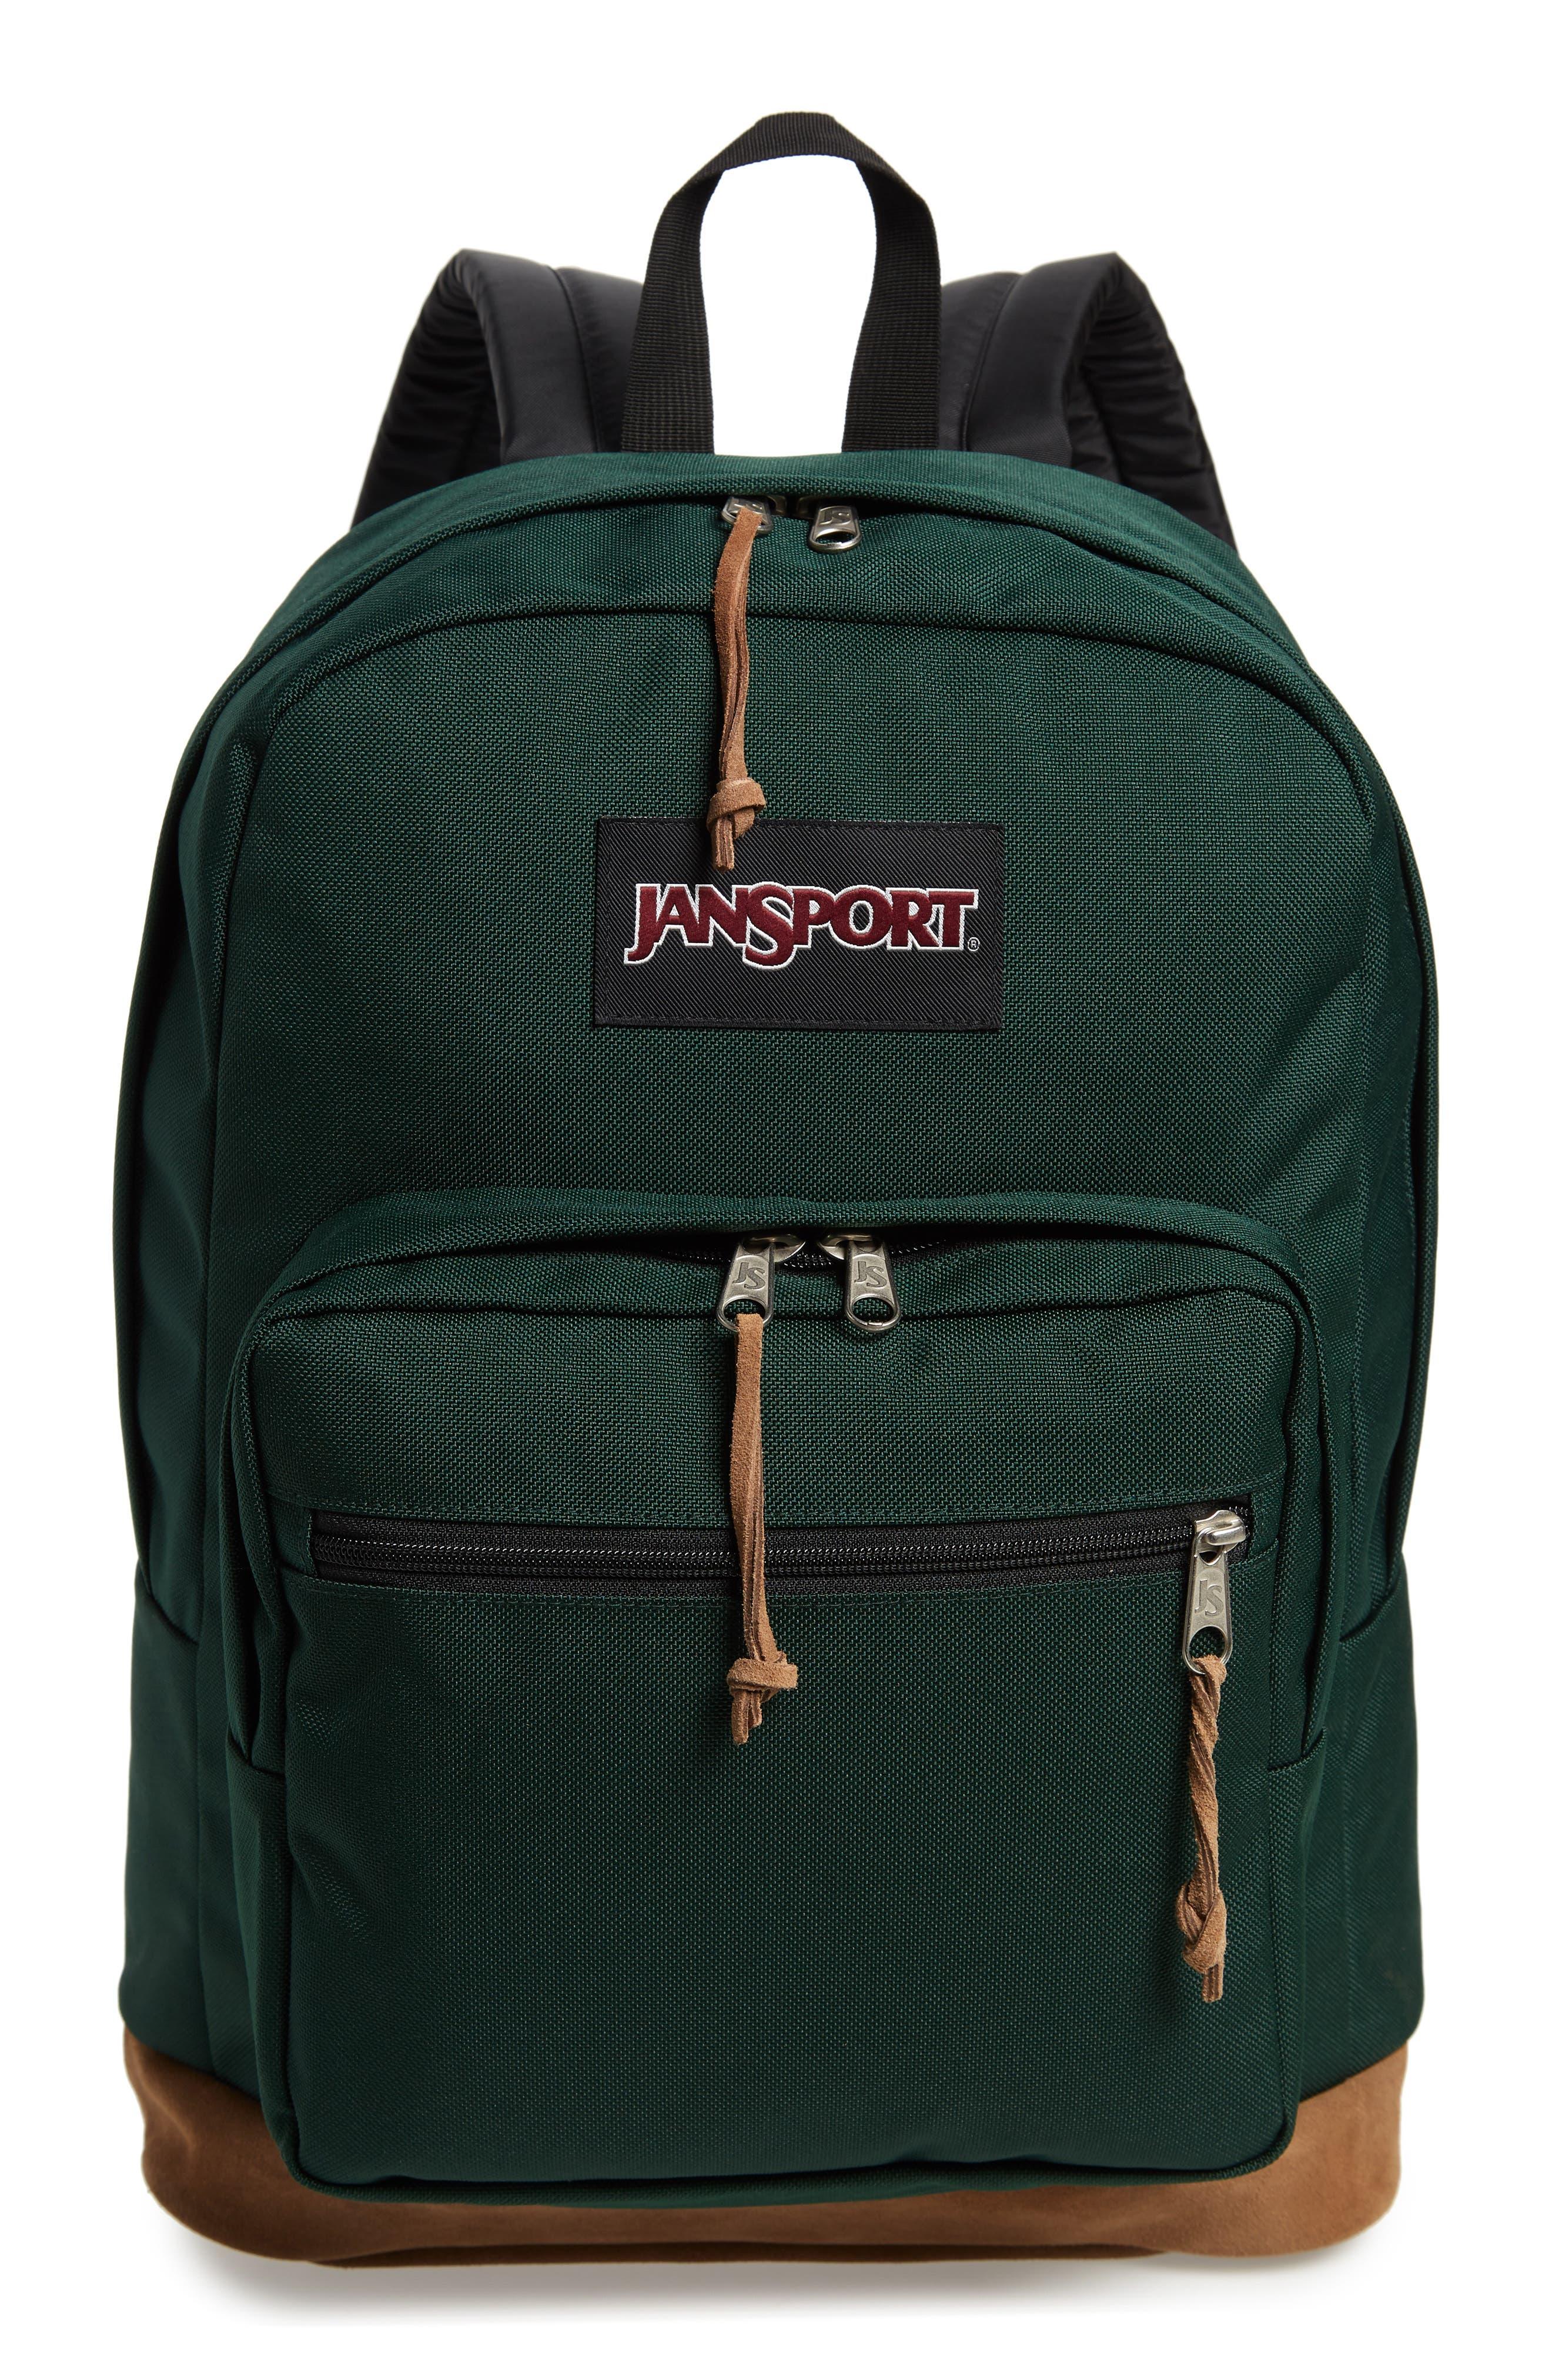 Jansport Right Pack Backpack - Green